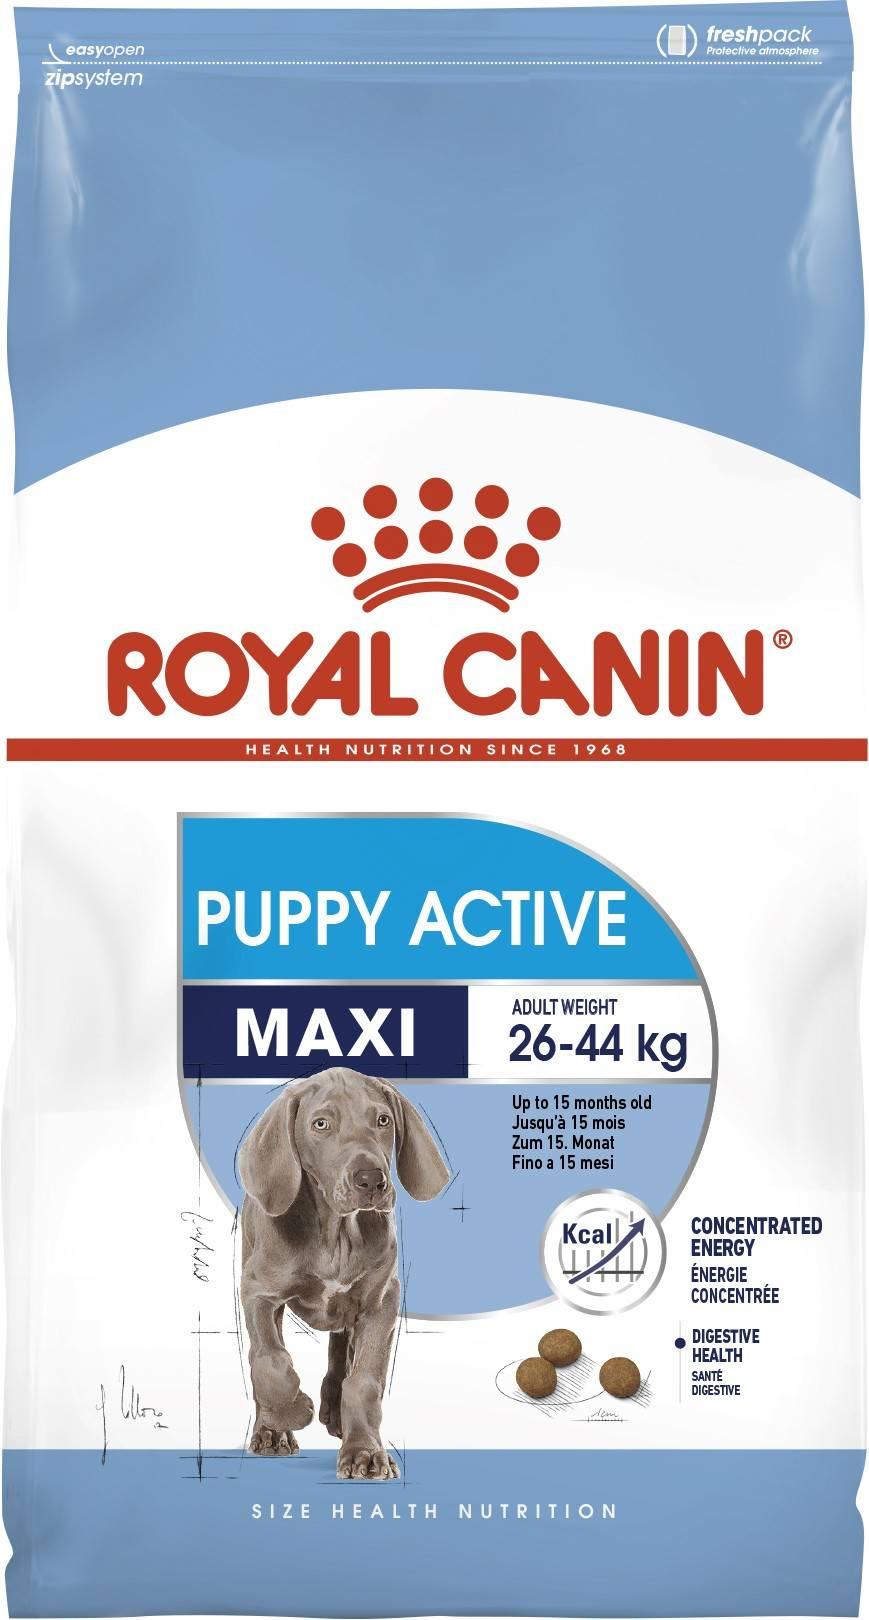 ROYAL CANIN MAXI PUPPY ACTIVE – сухий корм для цуценят великих порід з високими енергетичними потребами